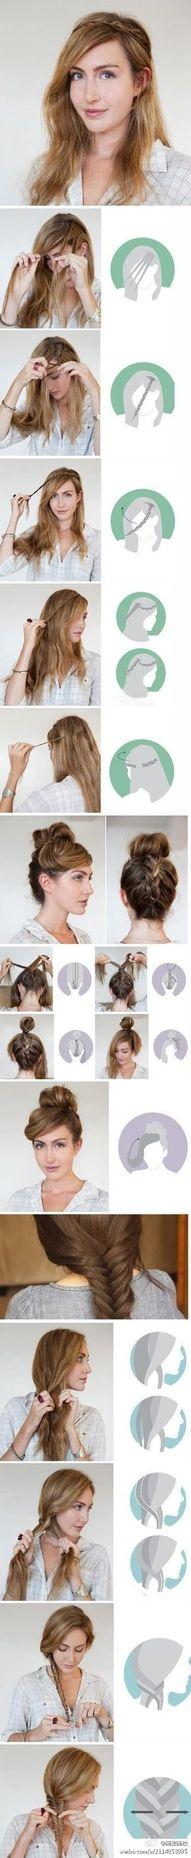 Multiple hairstyle tutorial ! hairstyle hair longhair style hairtutorial easyhair fashion beauty